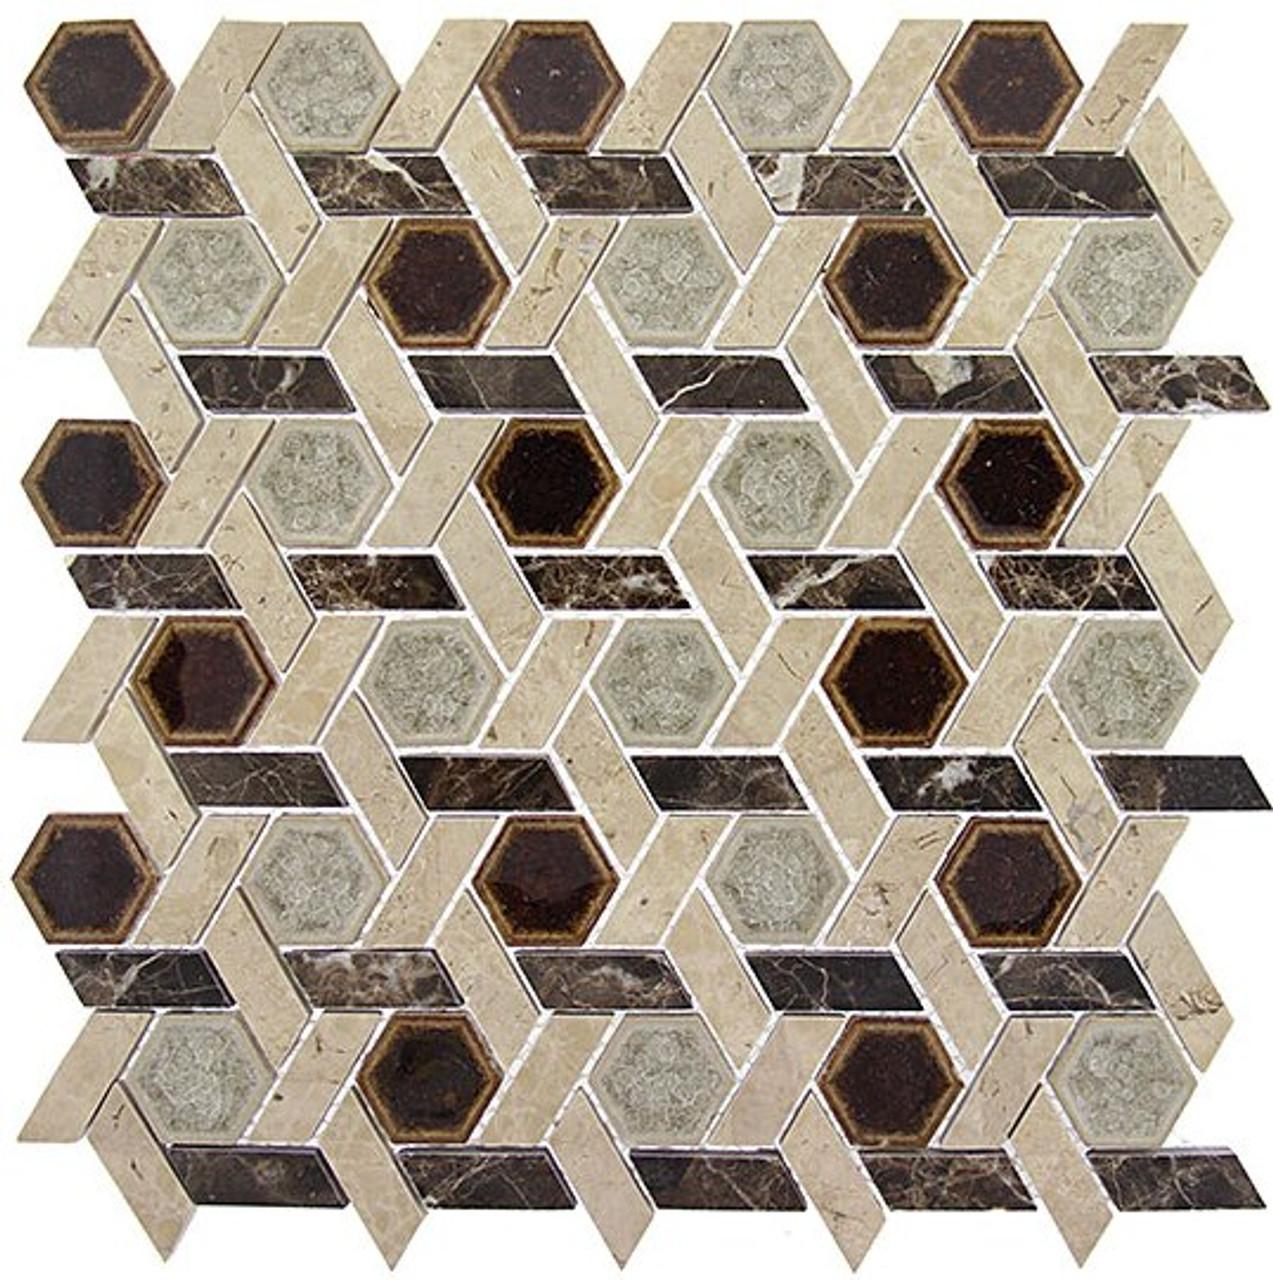 Bella Glass Tiles Tranquil Series Hexagon Temple Inspiration